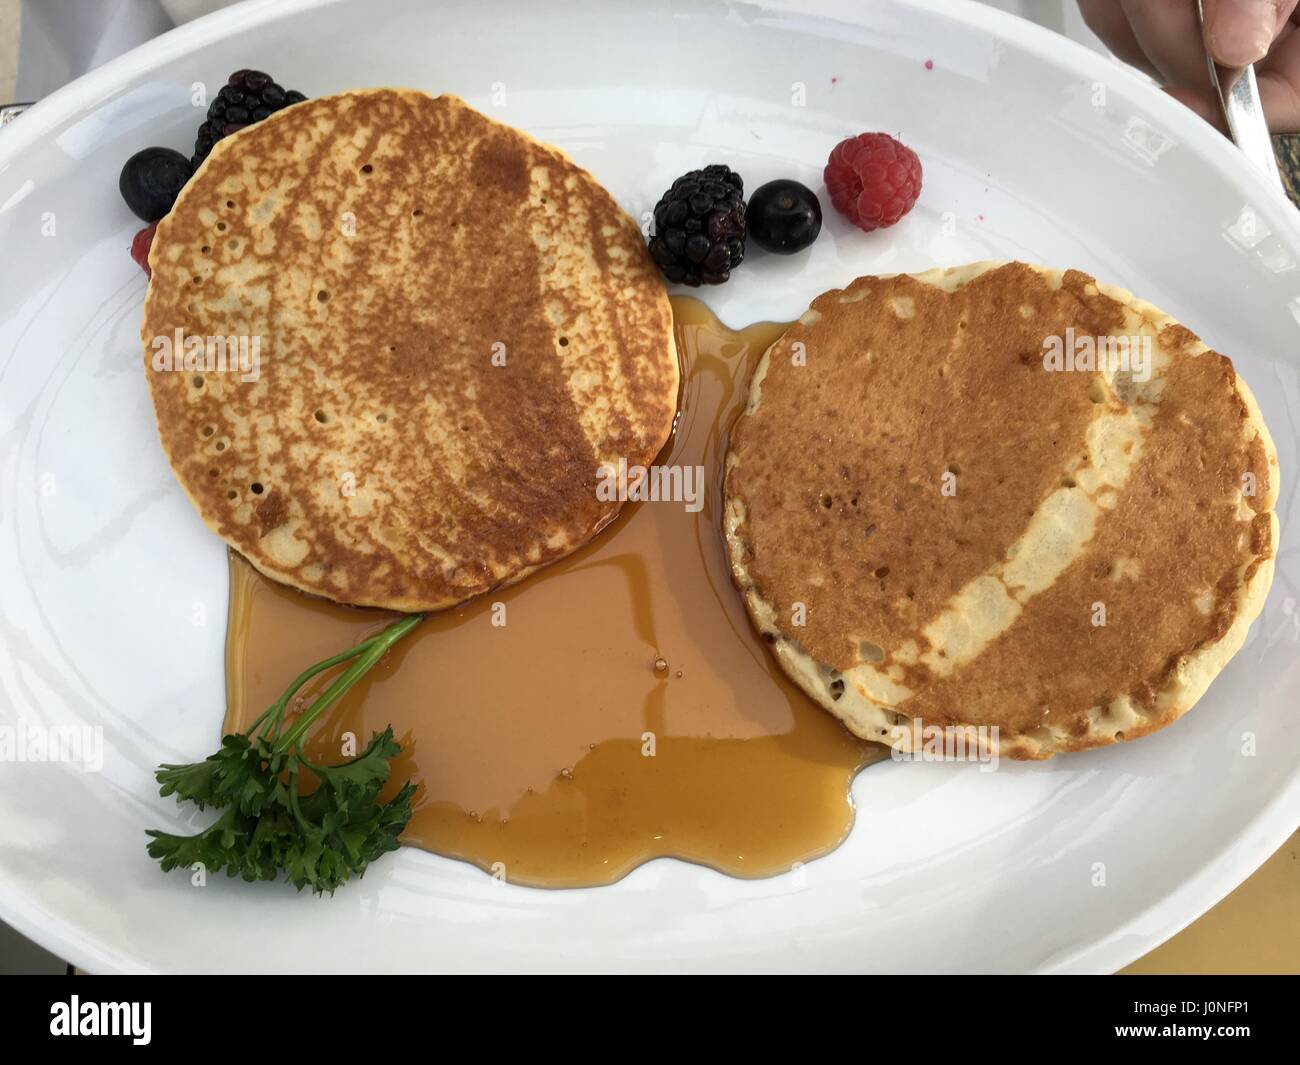 Maple Pancakes - Stock Image